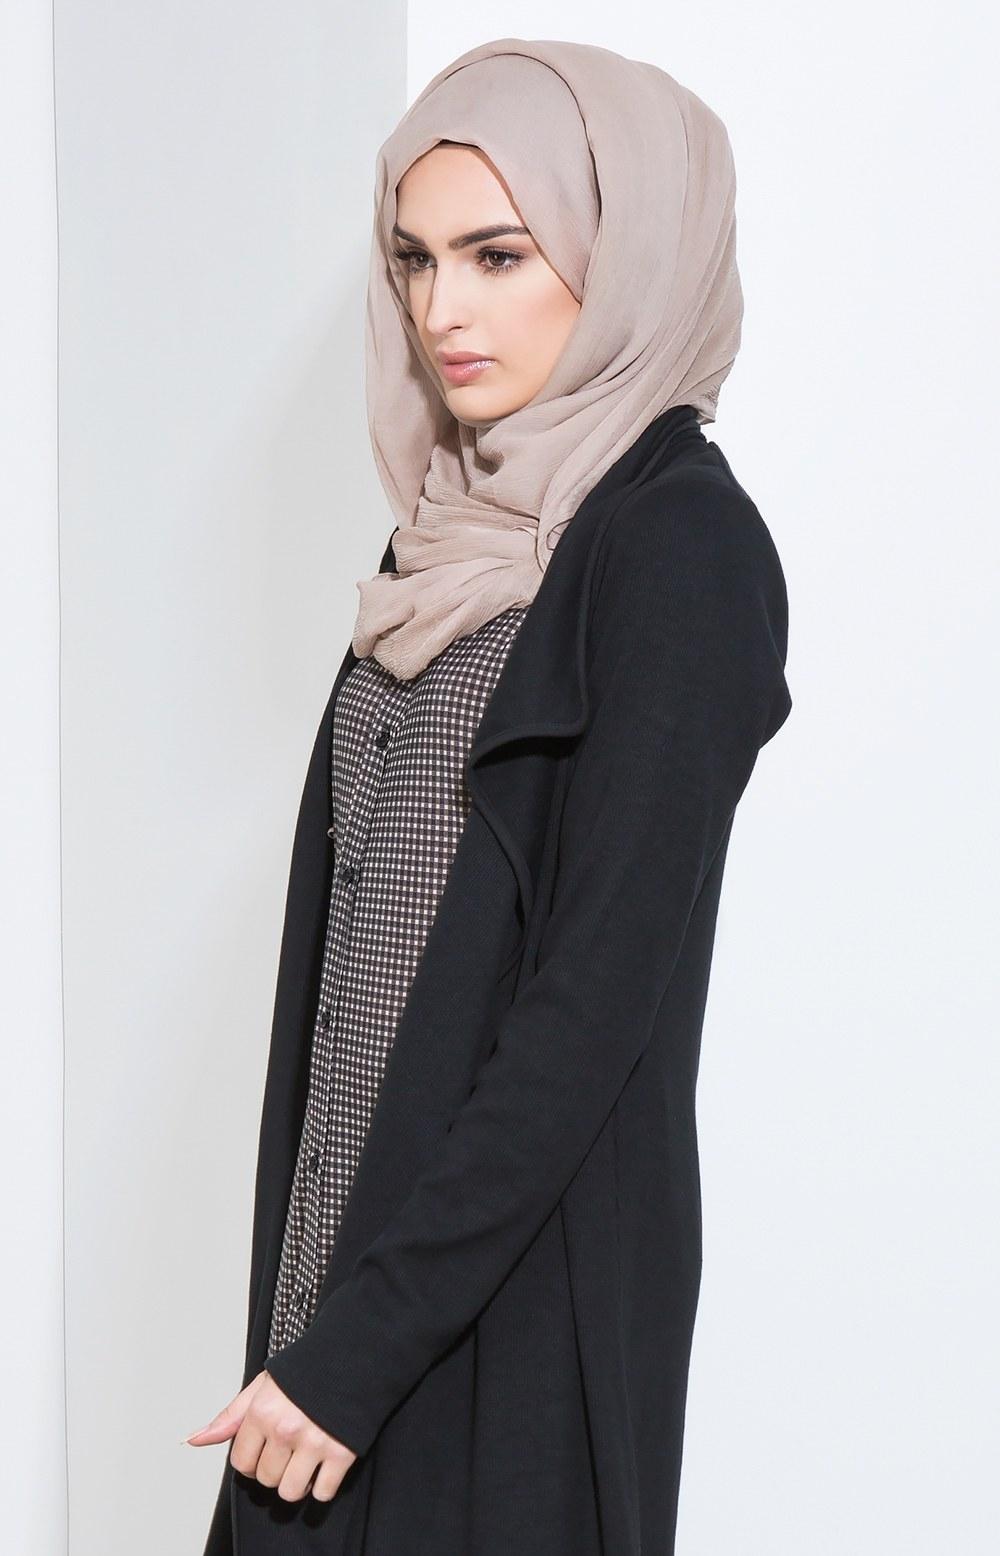 Bentuk Model Baju Lebaran Modern O2d5 25 Trend Model Baju Muslim Lebaran 2018 Simple & Modis